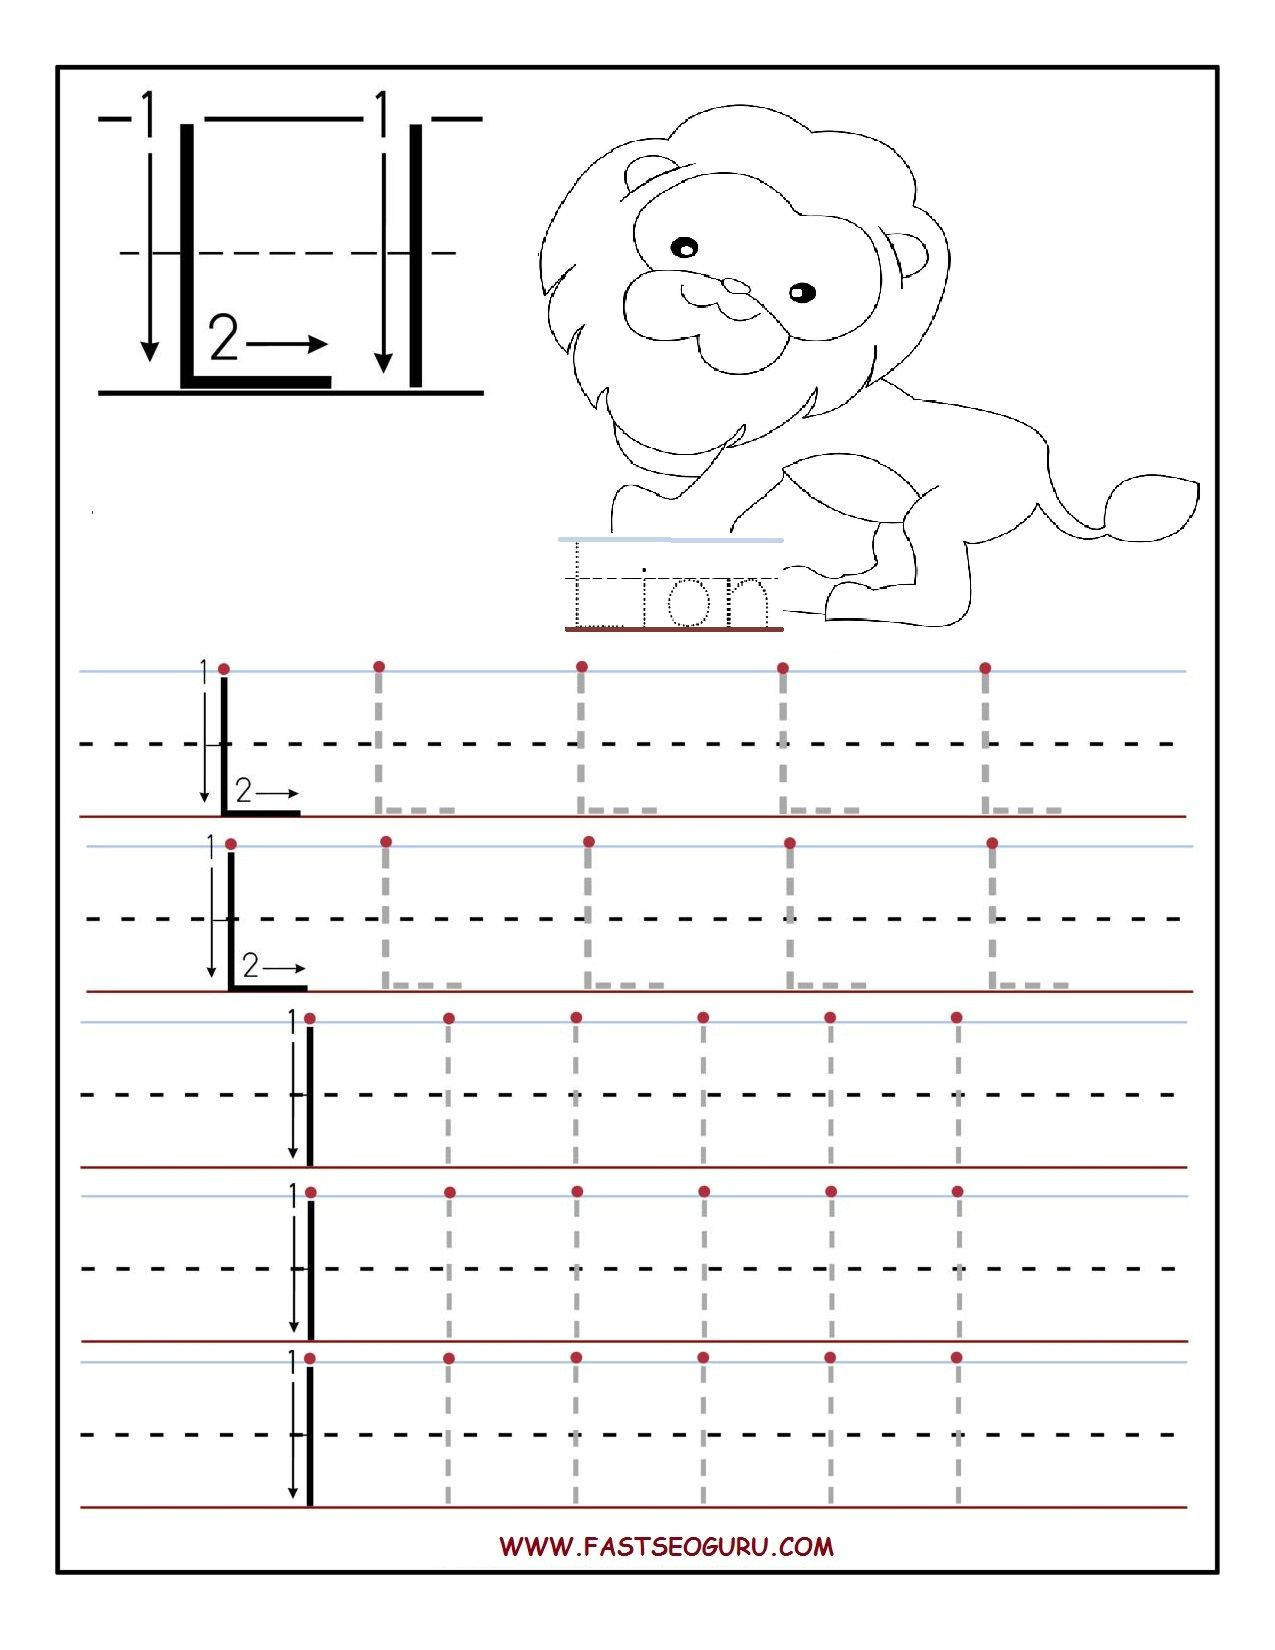 Printable Letter L Tracing Worksheets For Preschool in Letter L Worksheets Tracing